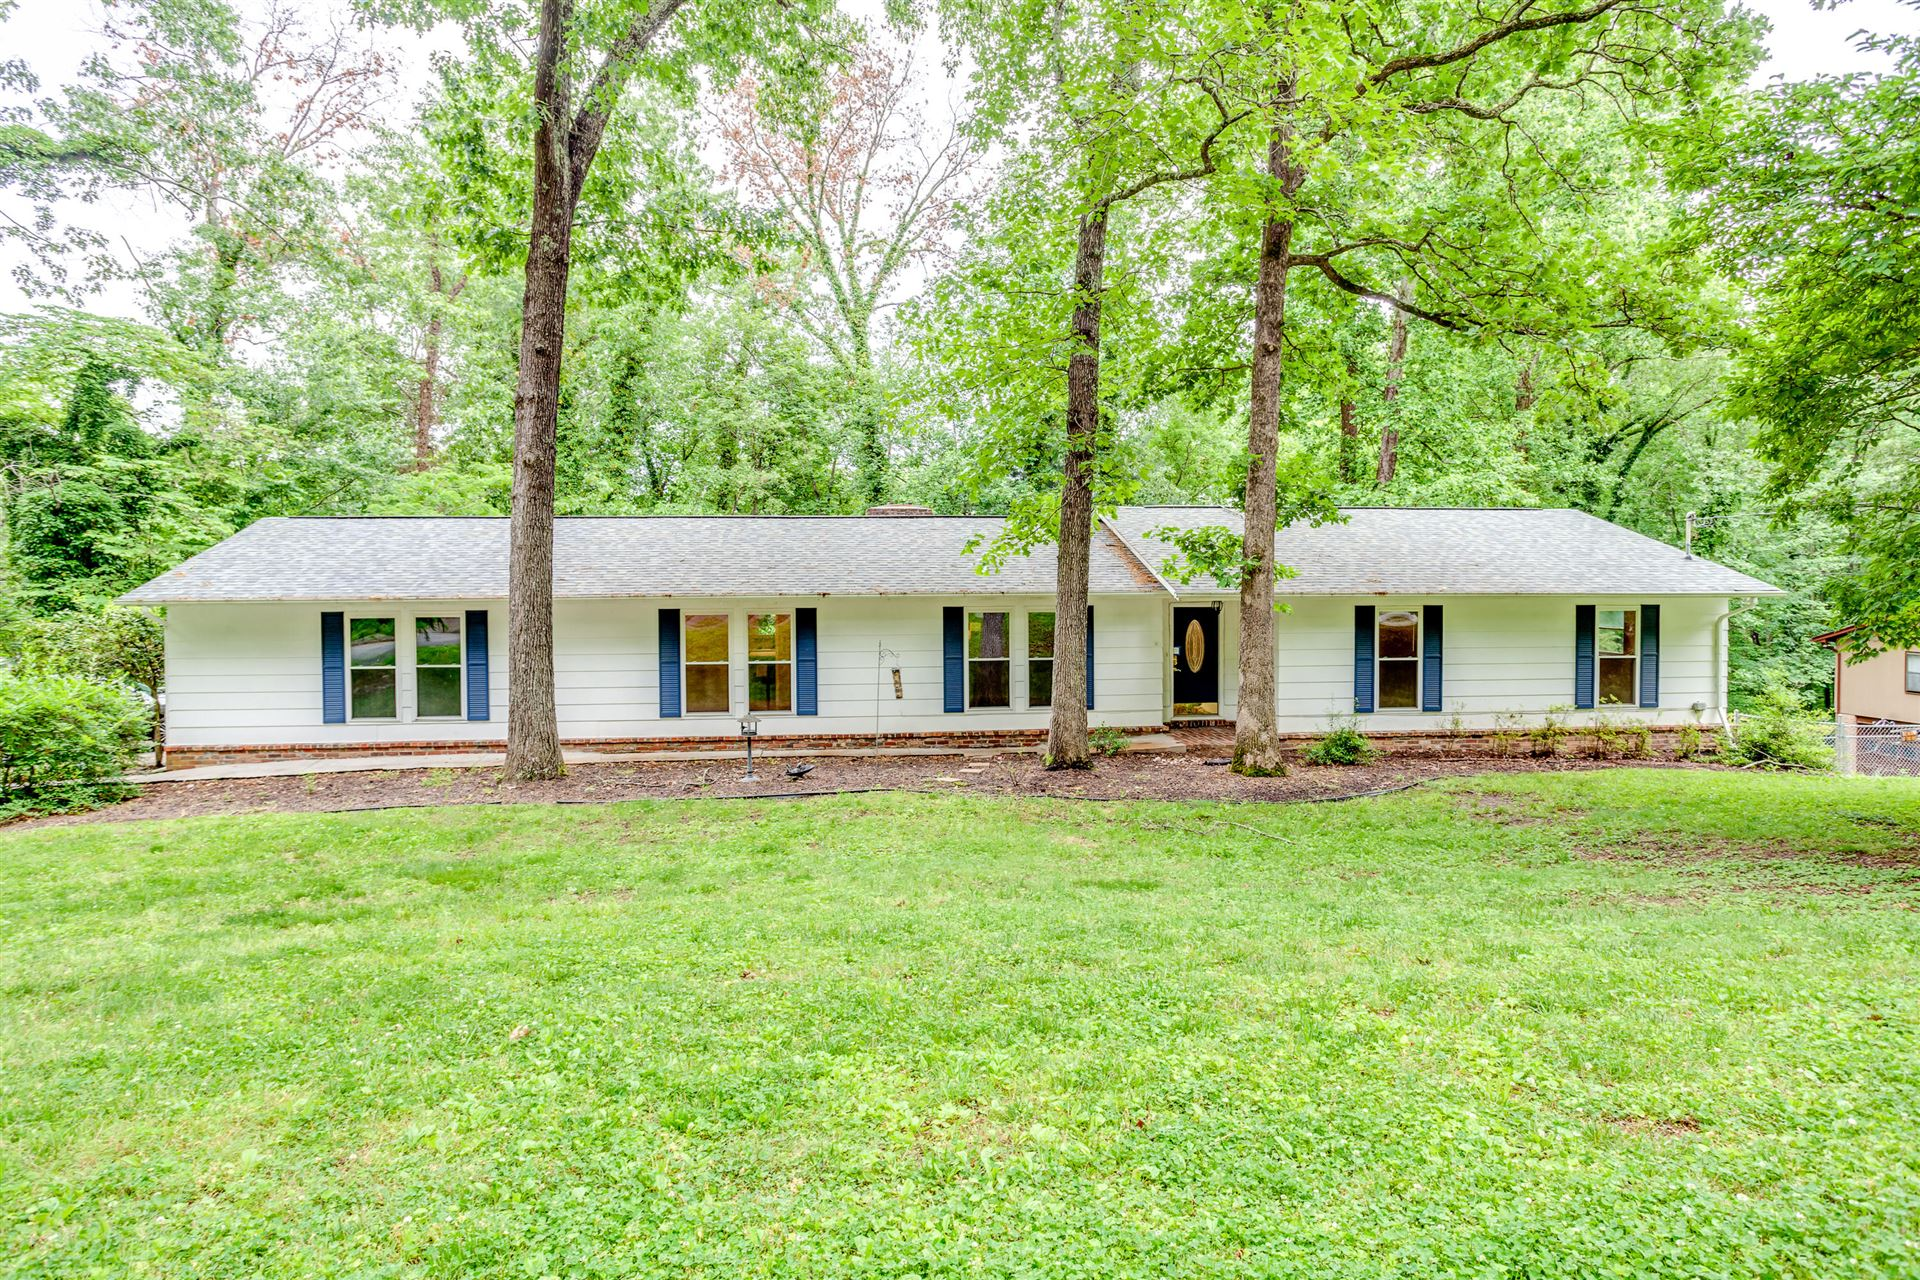 Photo of 103 Neville Lane, Oak Ridge, TN 37830 (MLS # 1111494)